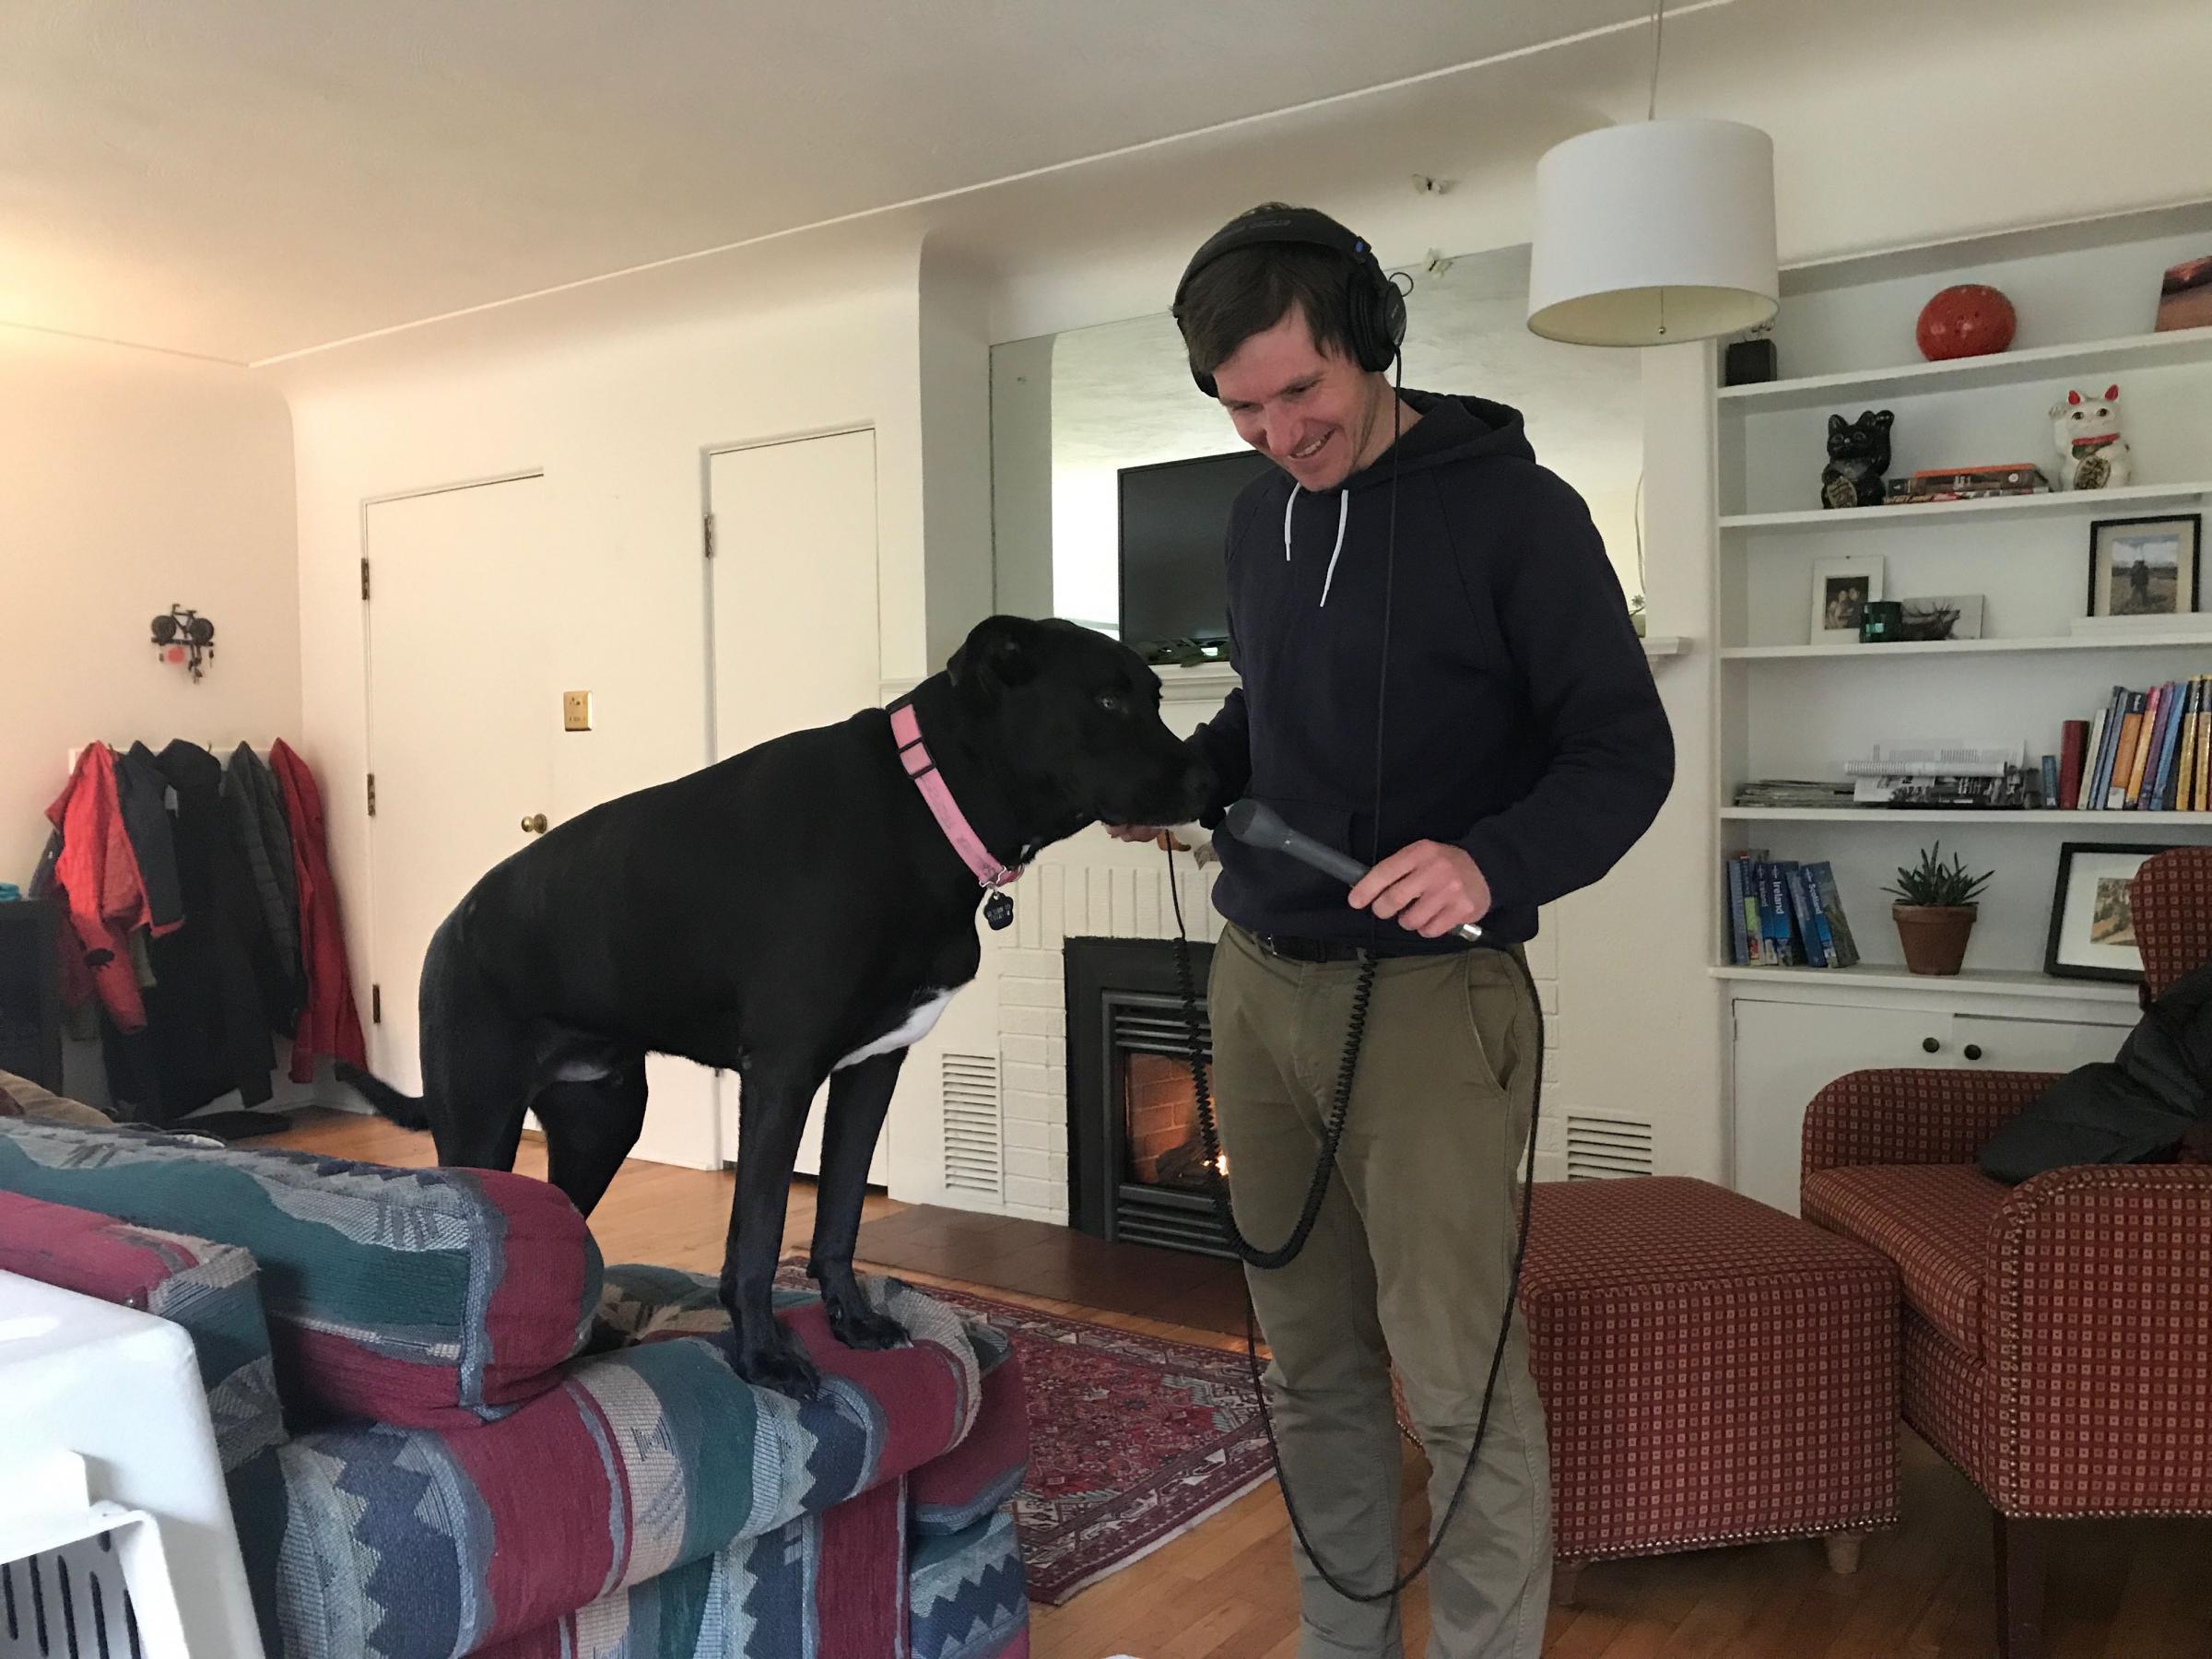 JPR reporter Erik Neumann interviews Sam a foster dog in Ashland that is currently up for adoption